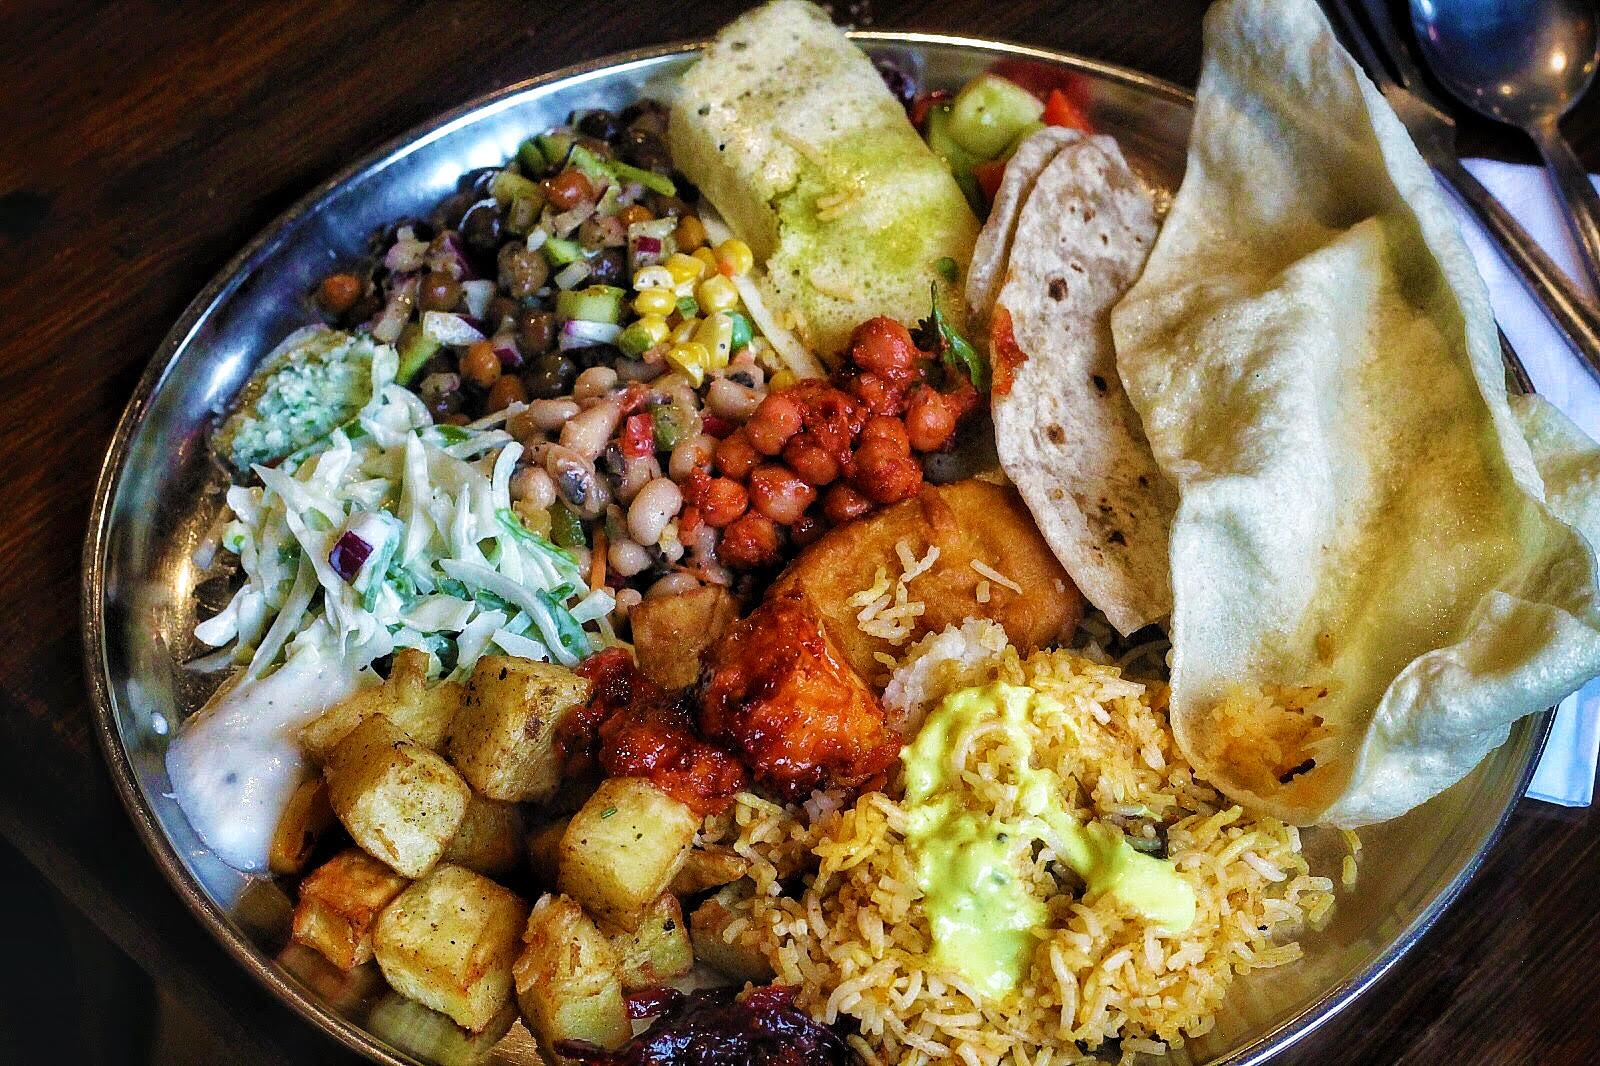 vegetarian indian buffet at Diwana Bhel Poori House